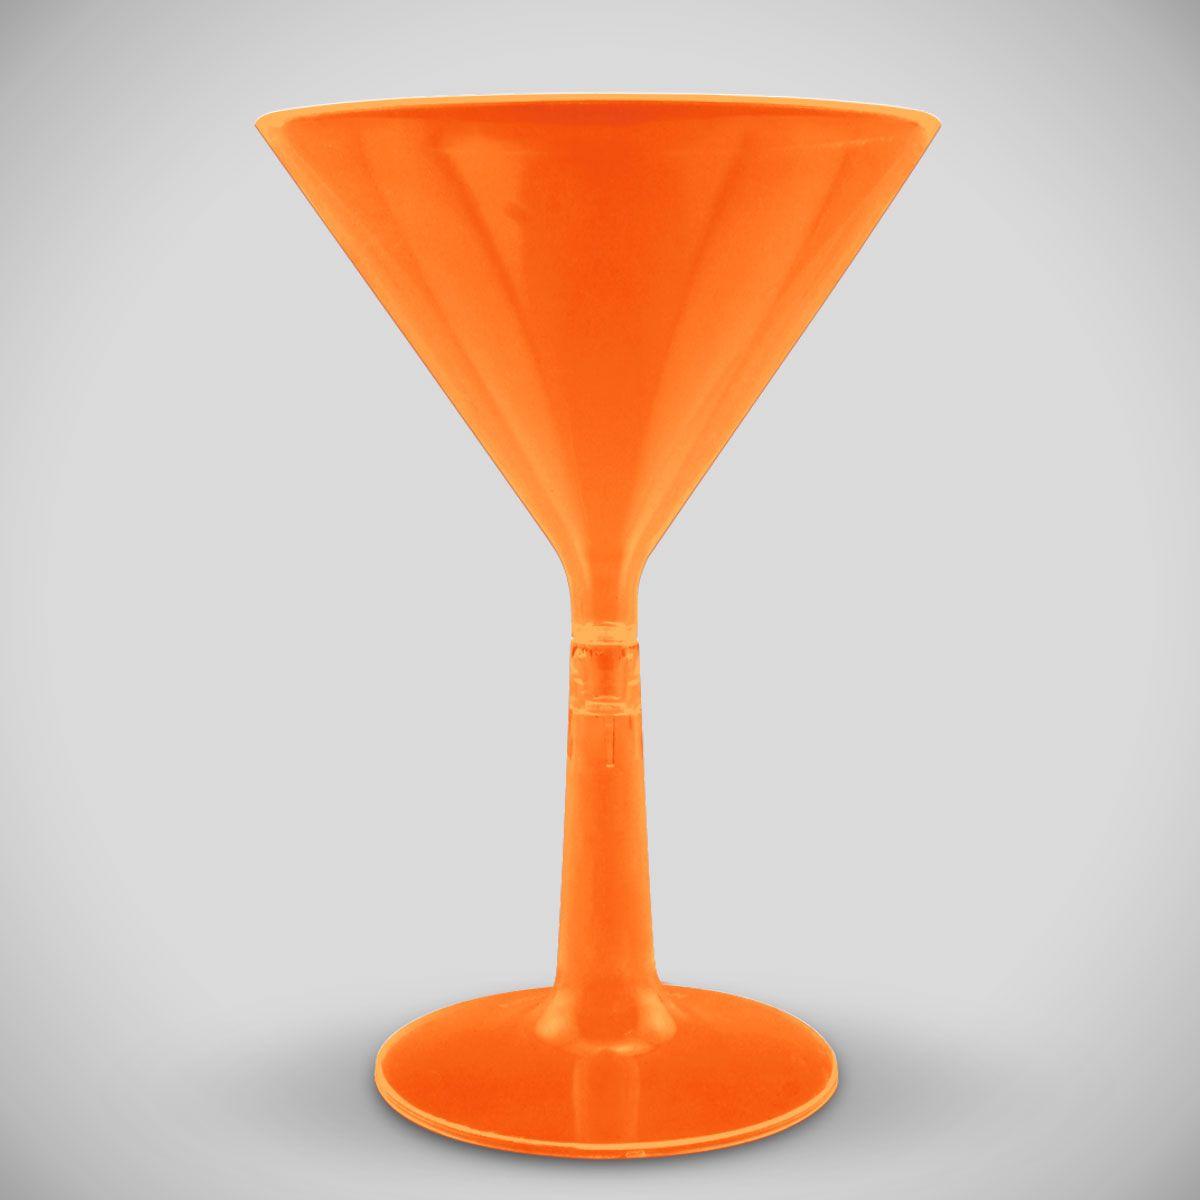 Orange Neon Plastic Martini Glass PAR726EA